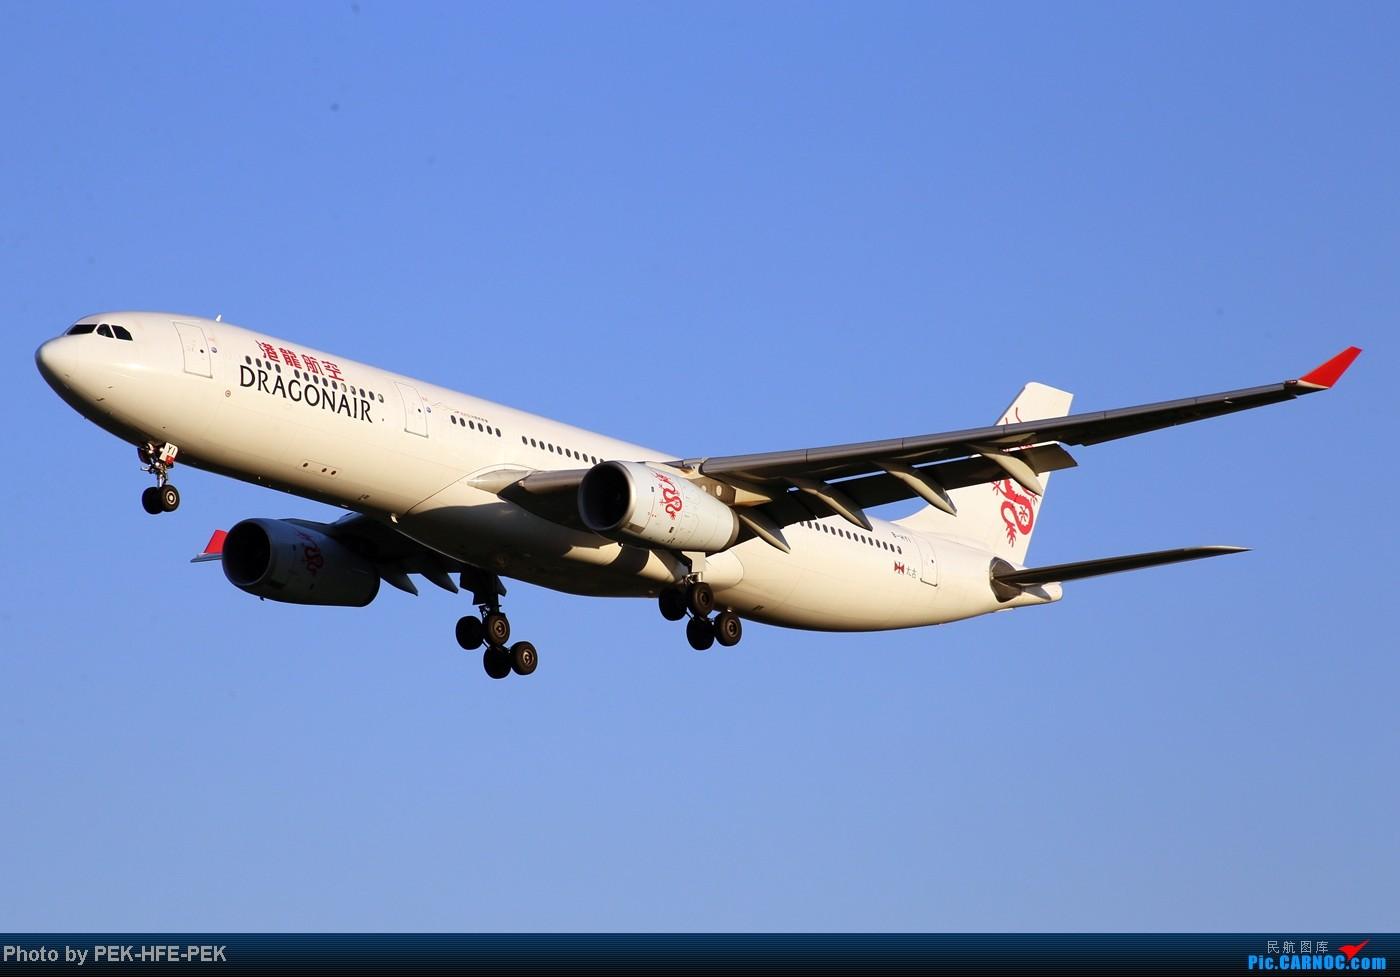 Re:[原创][AutumnKwok]趁apec假有时间把以前拍的图都发了~帝都巨好的天儿在八卦台拍的一组图 AIRBUS A330-300 B-HYI